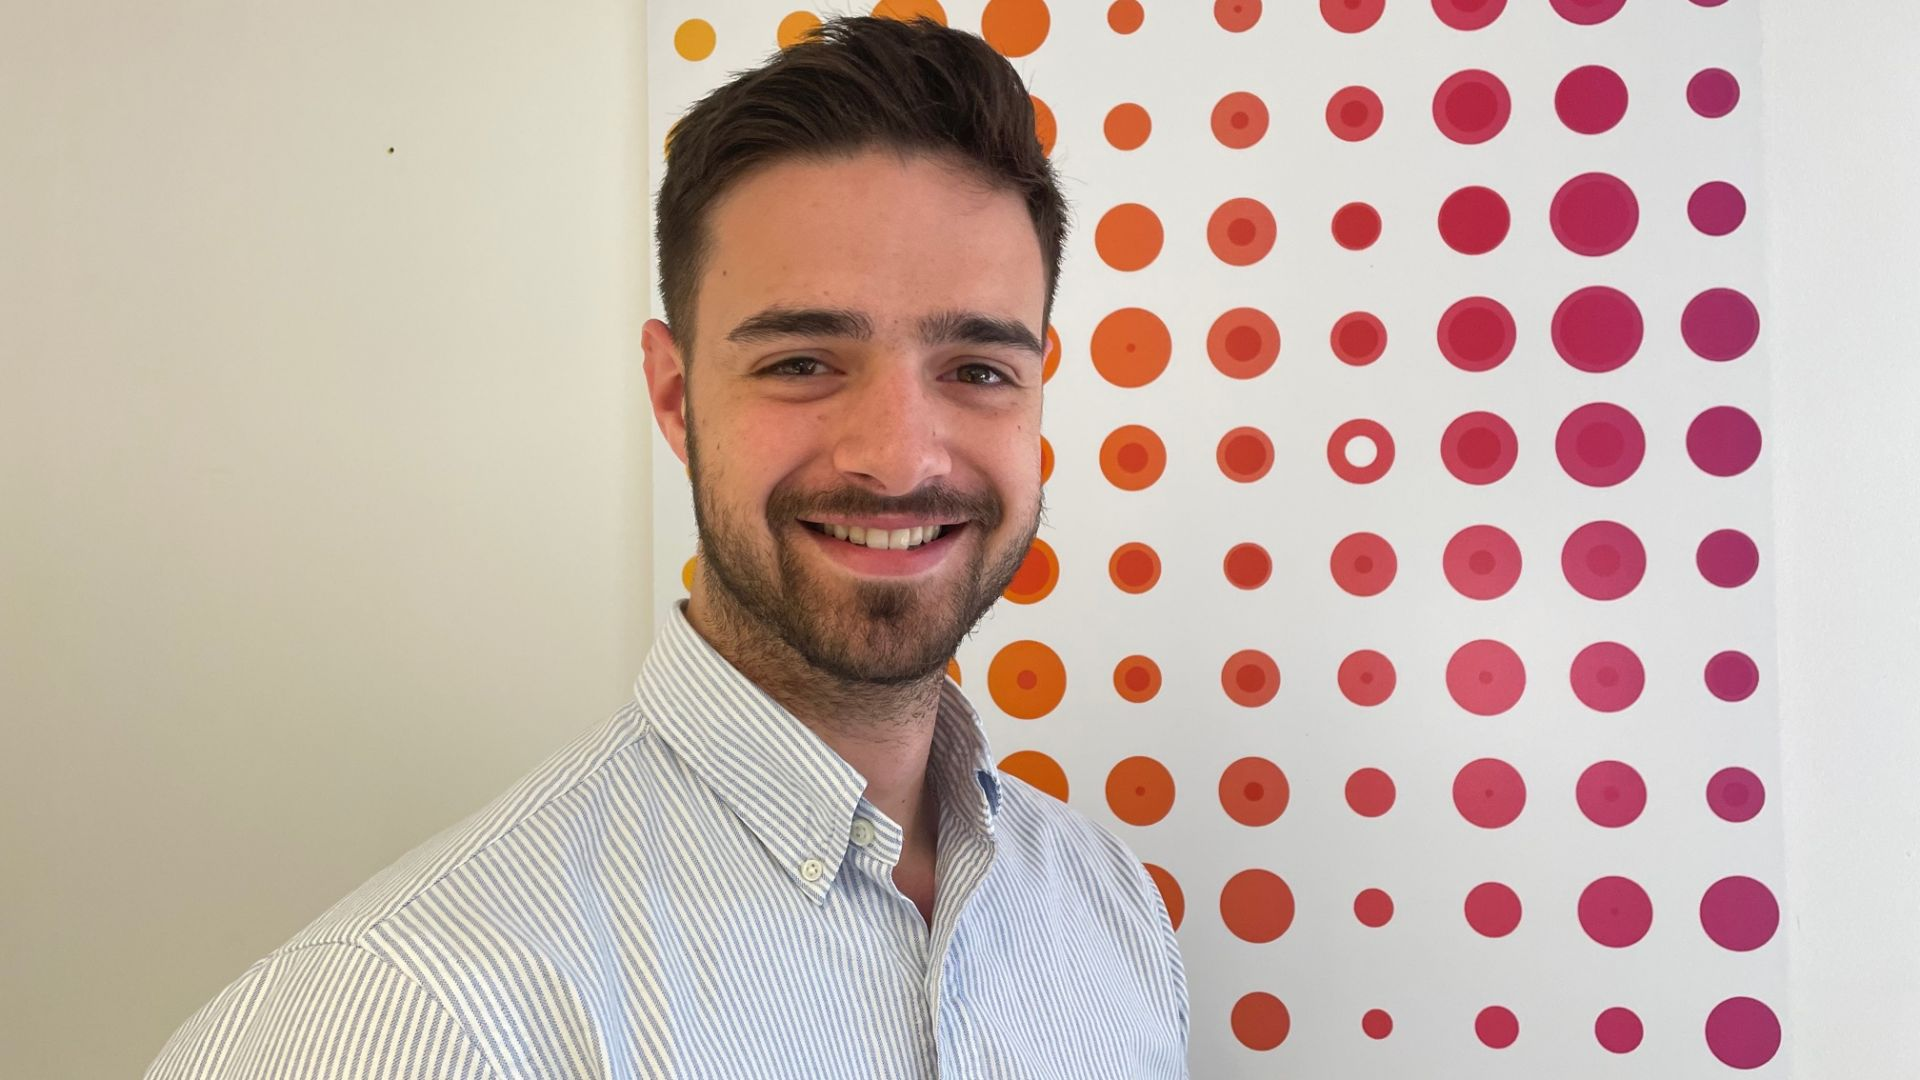 Hertfordshire marketing agency hires marketing account executive